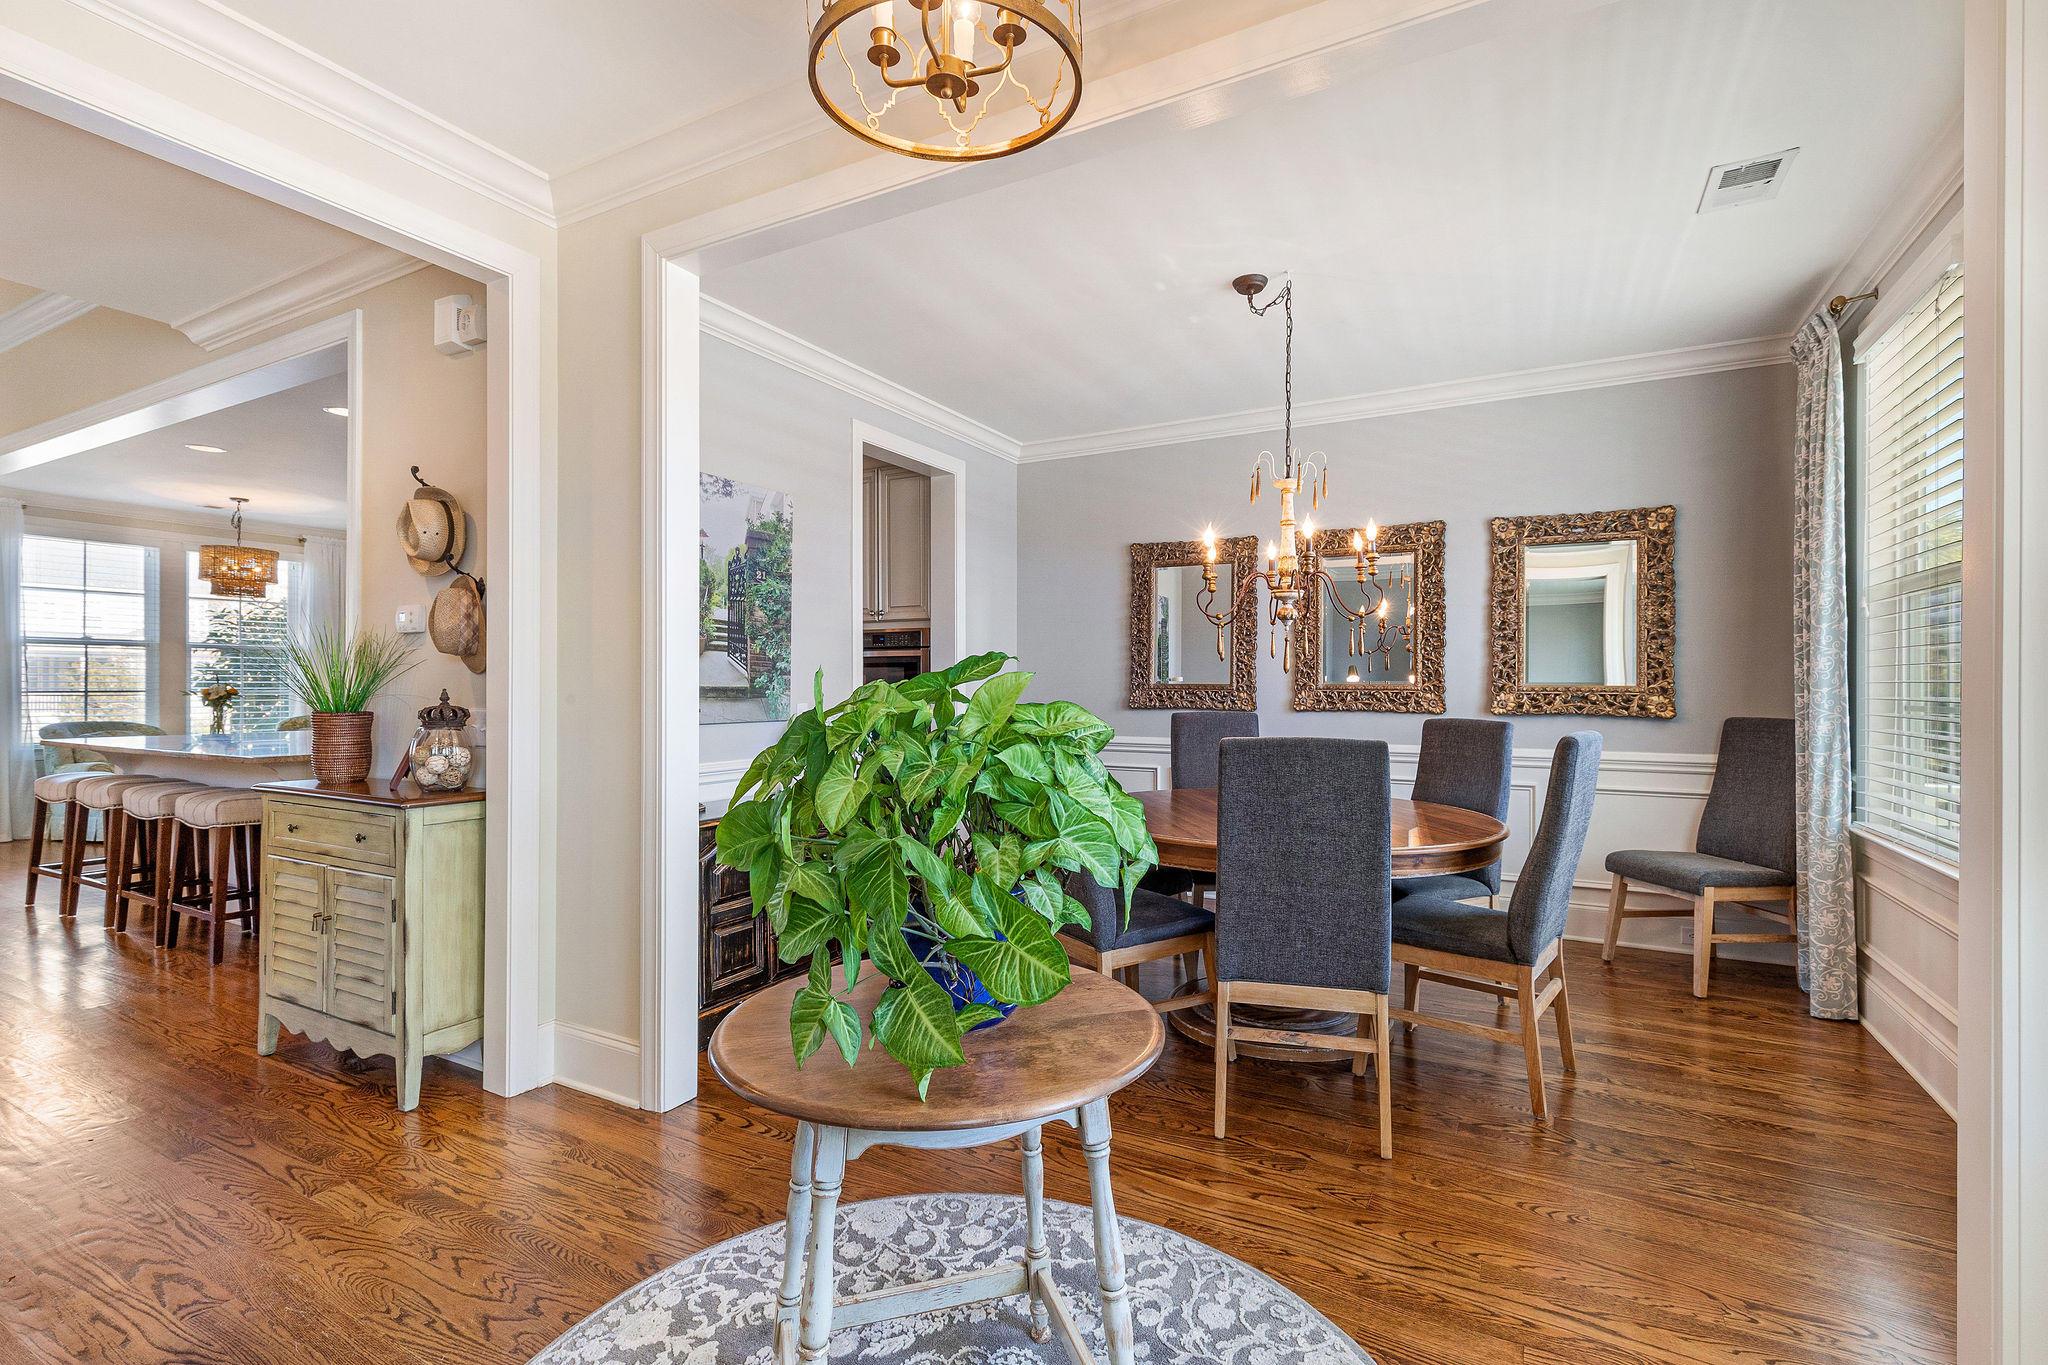 Dunes West Homes For Sale - 3212 Hatchway, Mount Pleasant, SC - 19